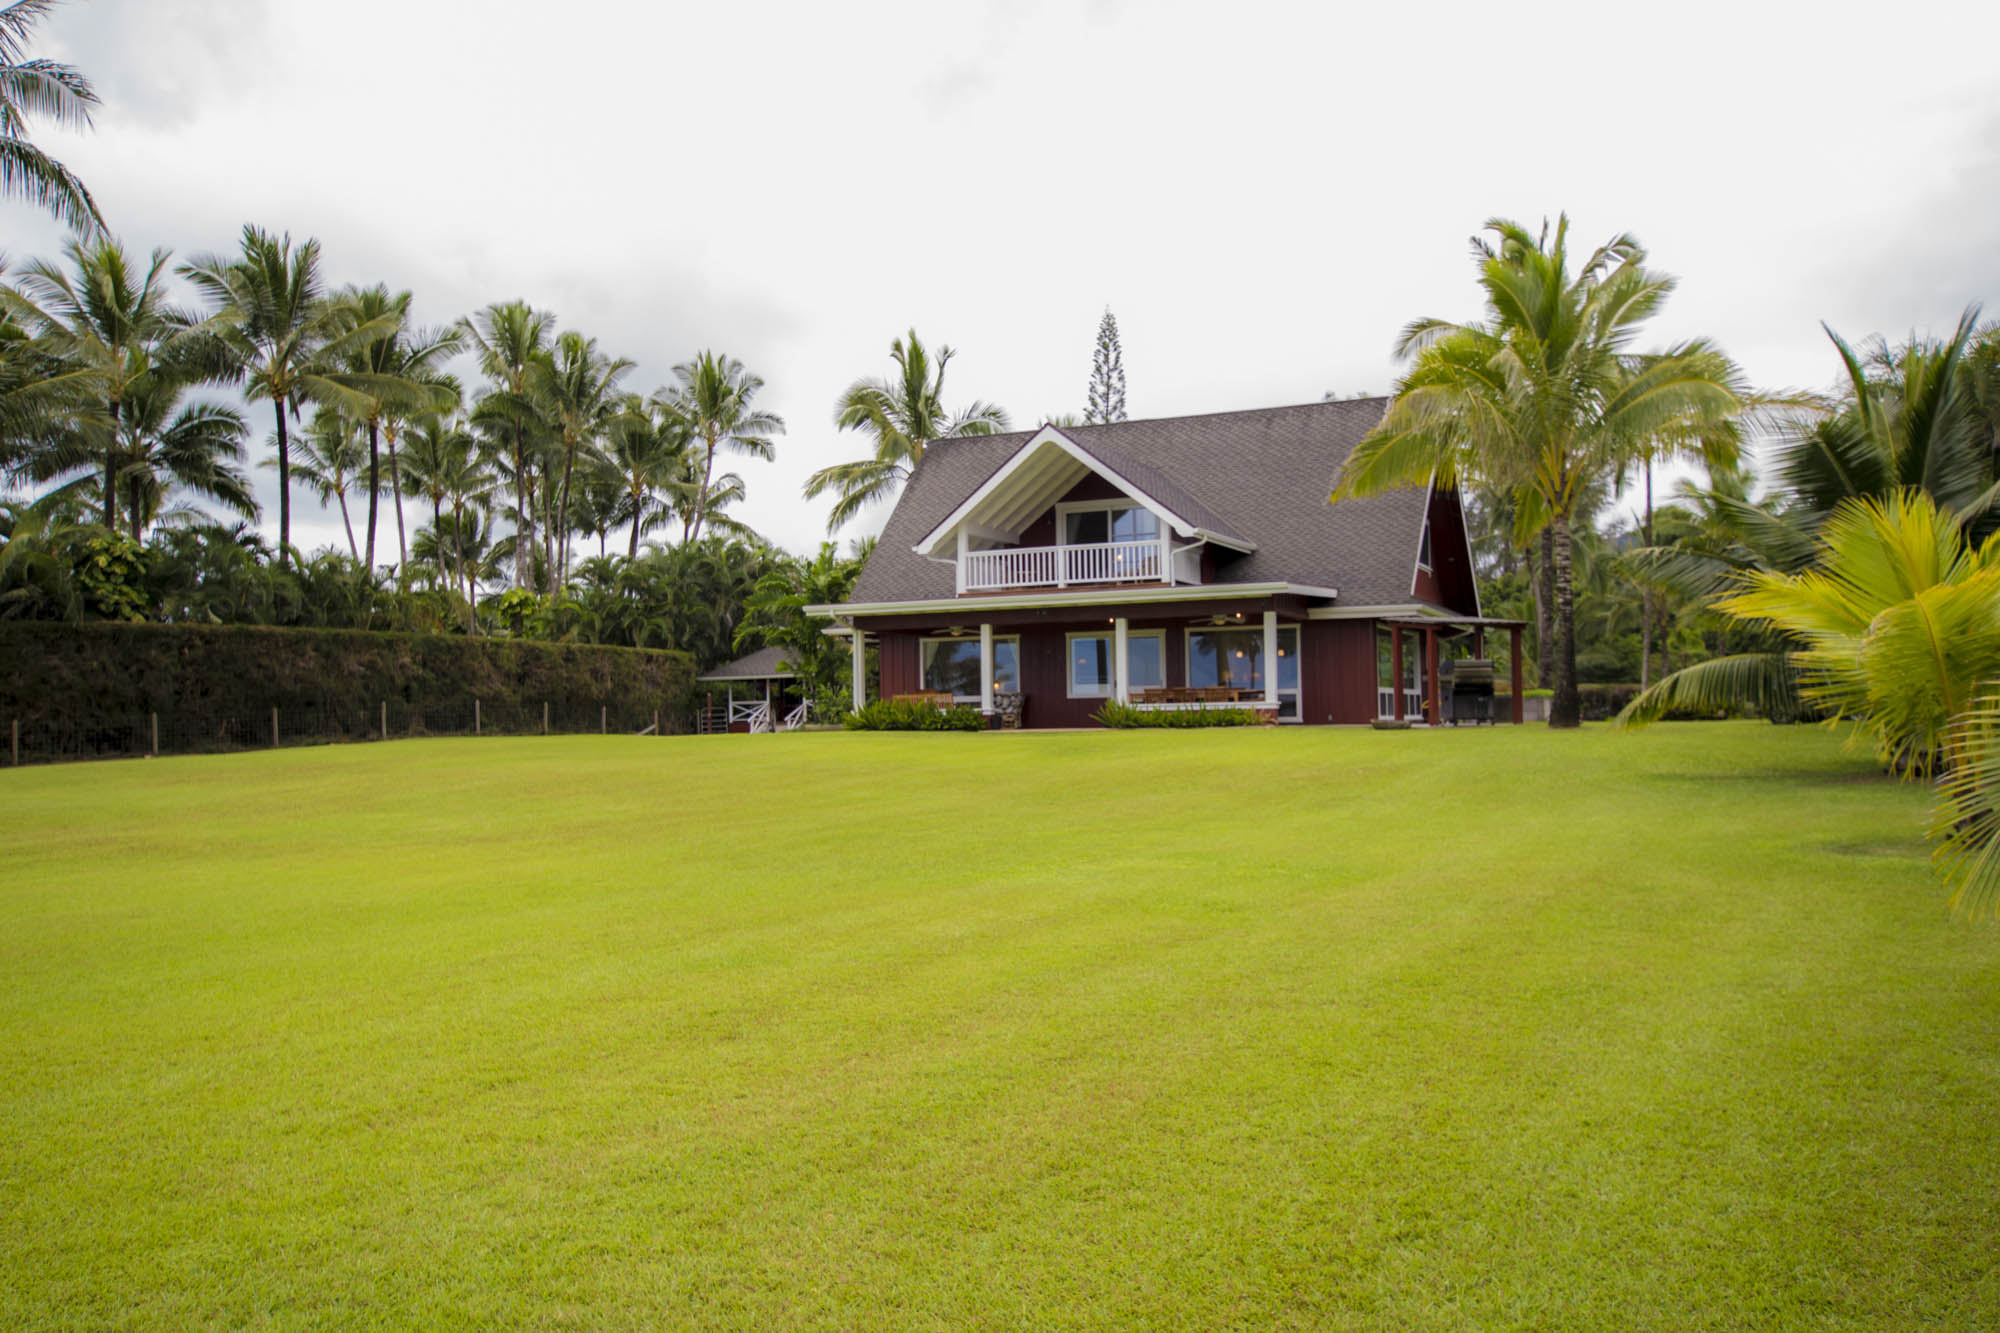 Kauai-217-Hanalei Bay8